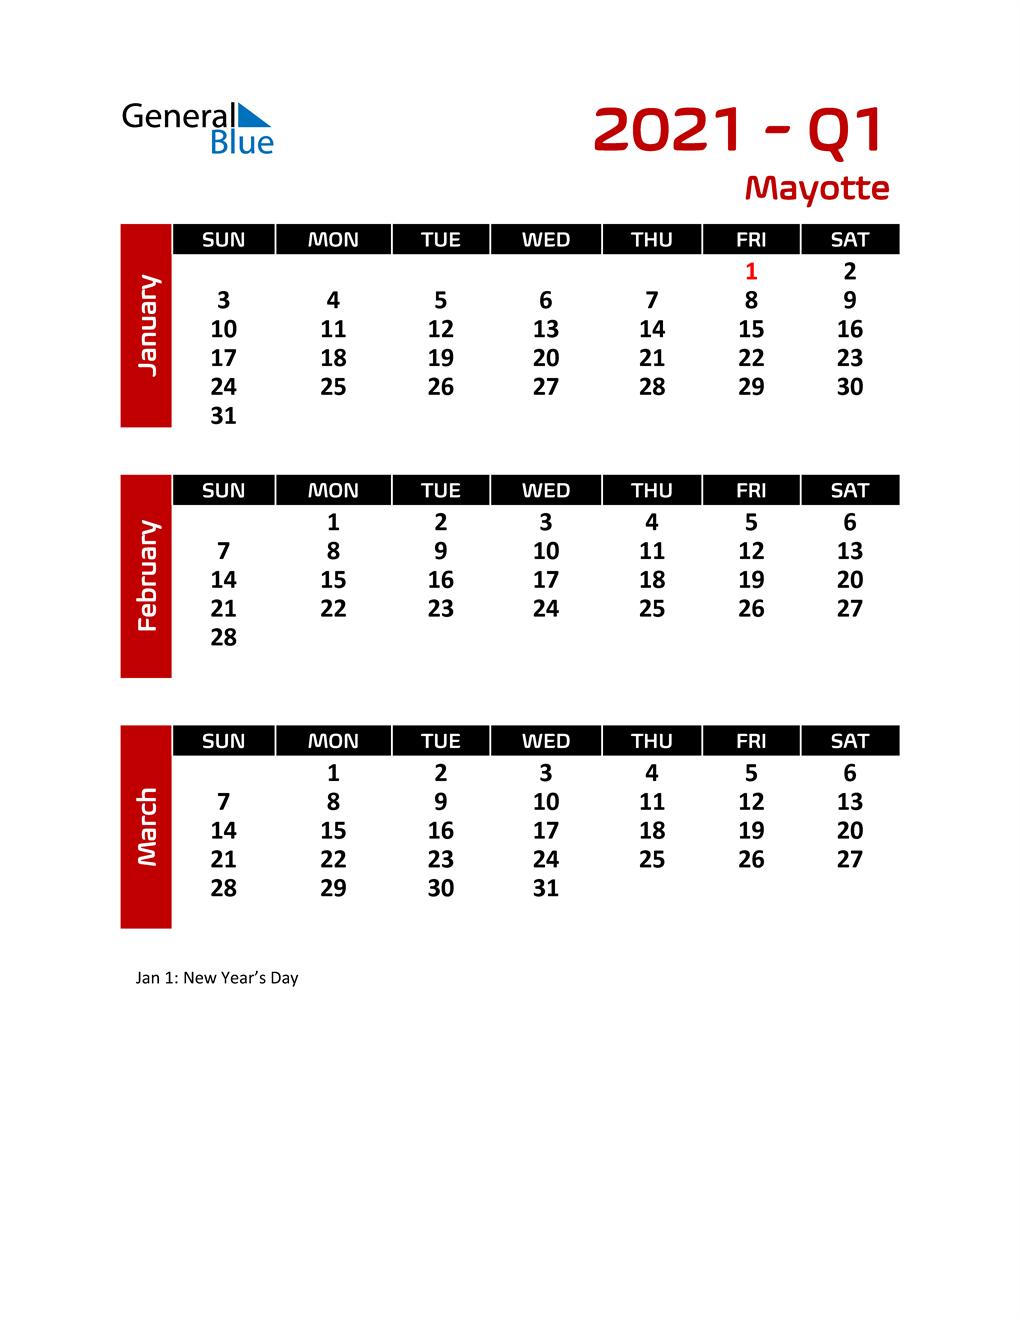 Q1 2021 Calendar with Holidays